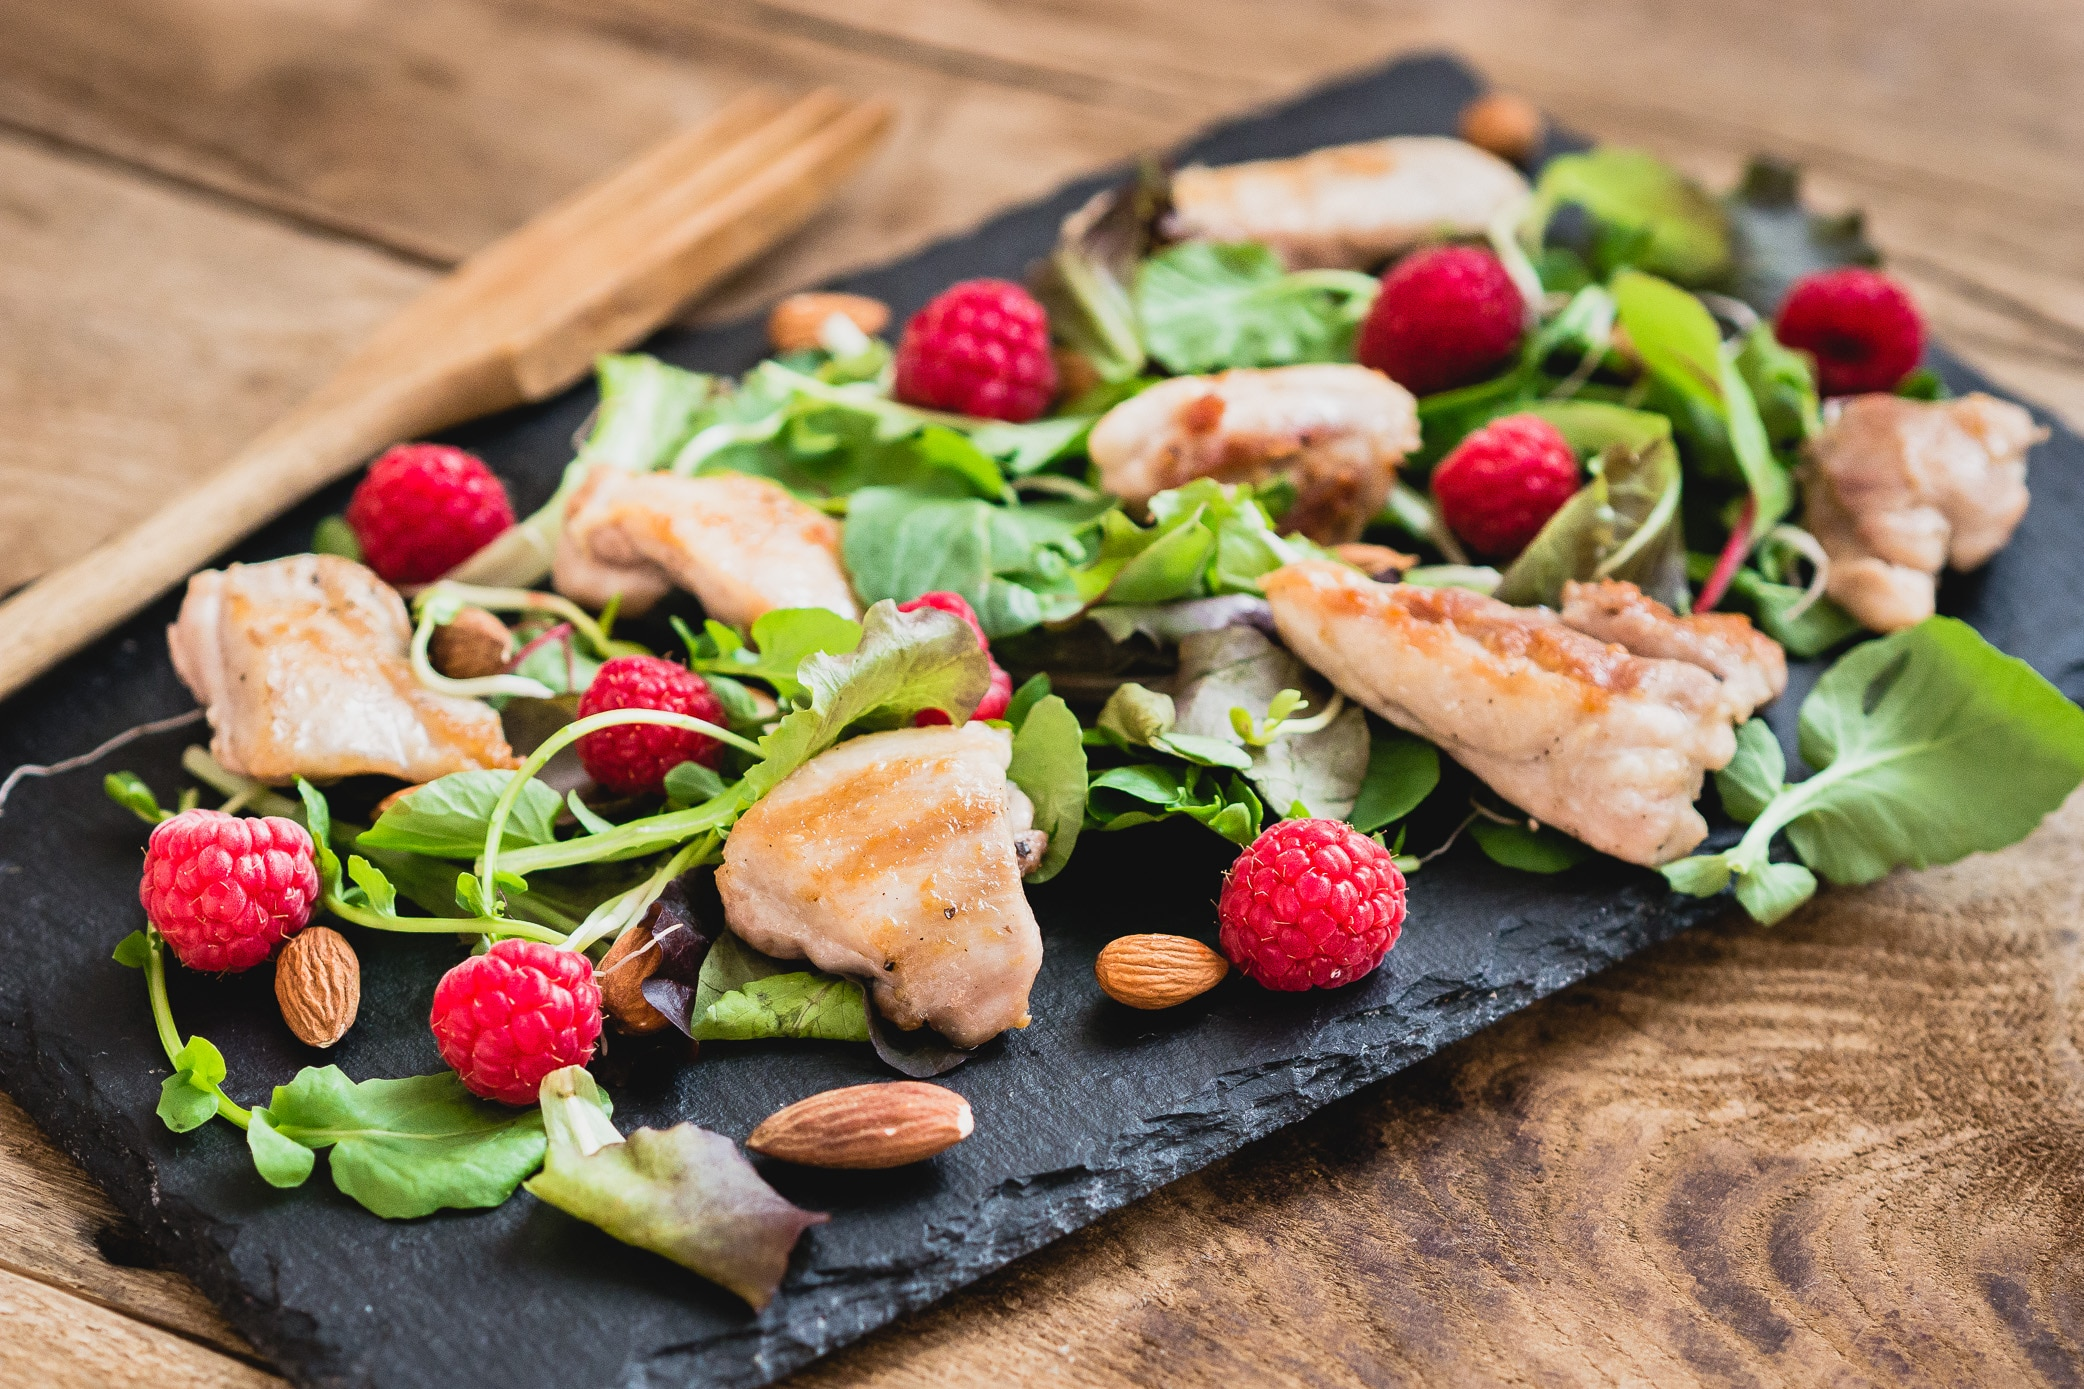 Salade met gegrilde kip en jam dressing